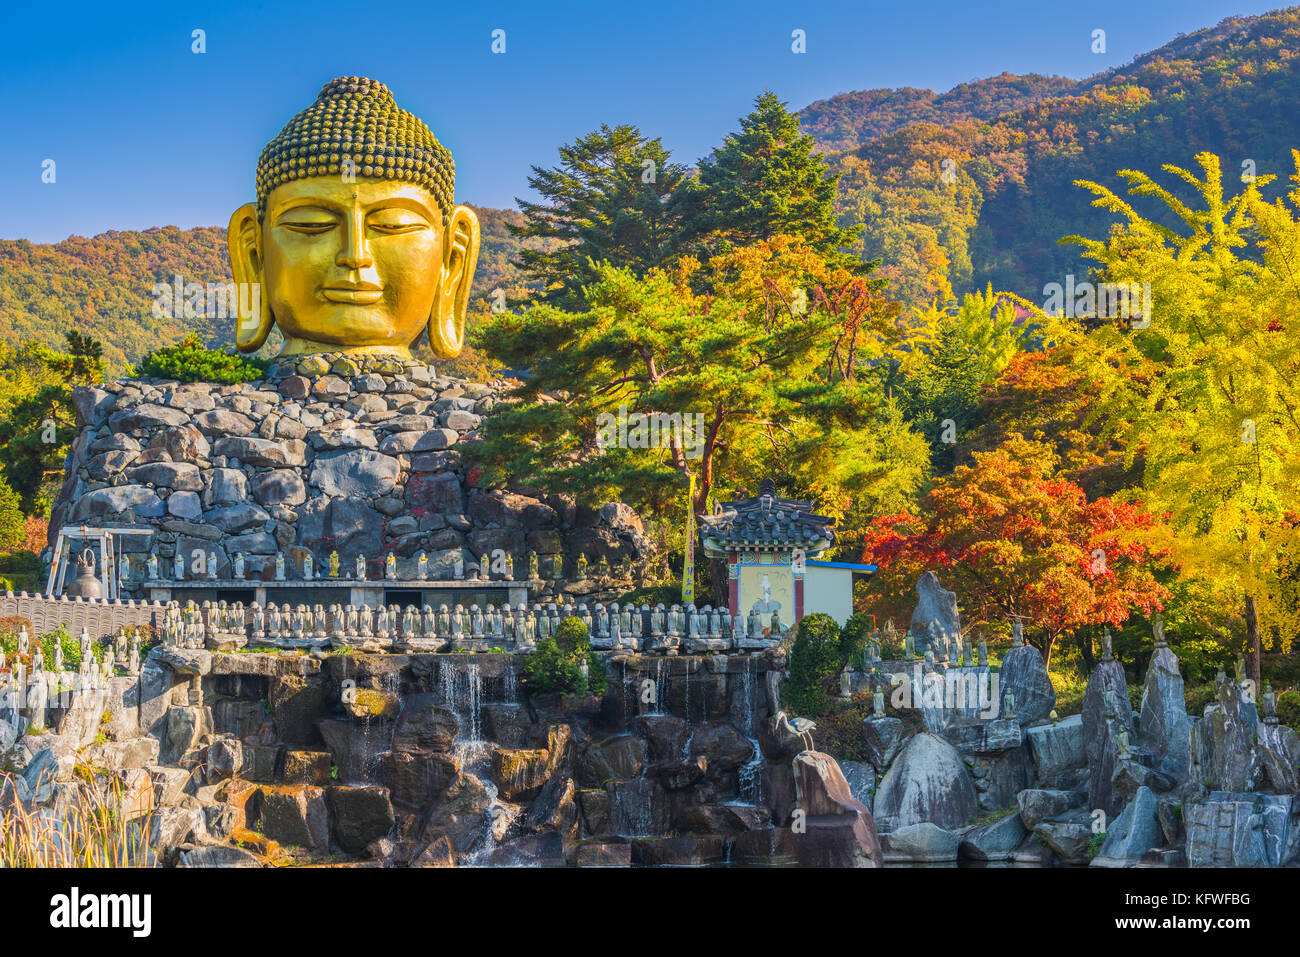 Autumn of Statue of Buddha in Wawoo Temple, Yong-in. Seoul, Korea - Stock Image